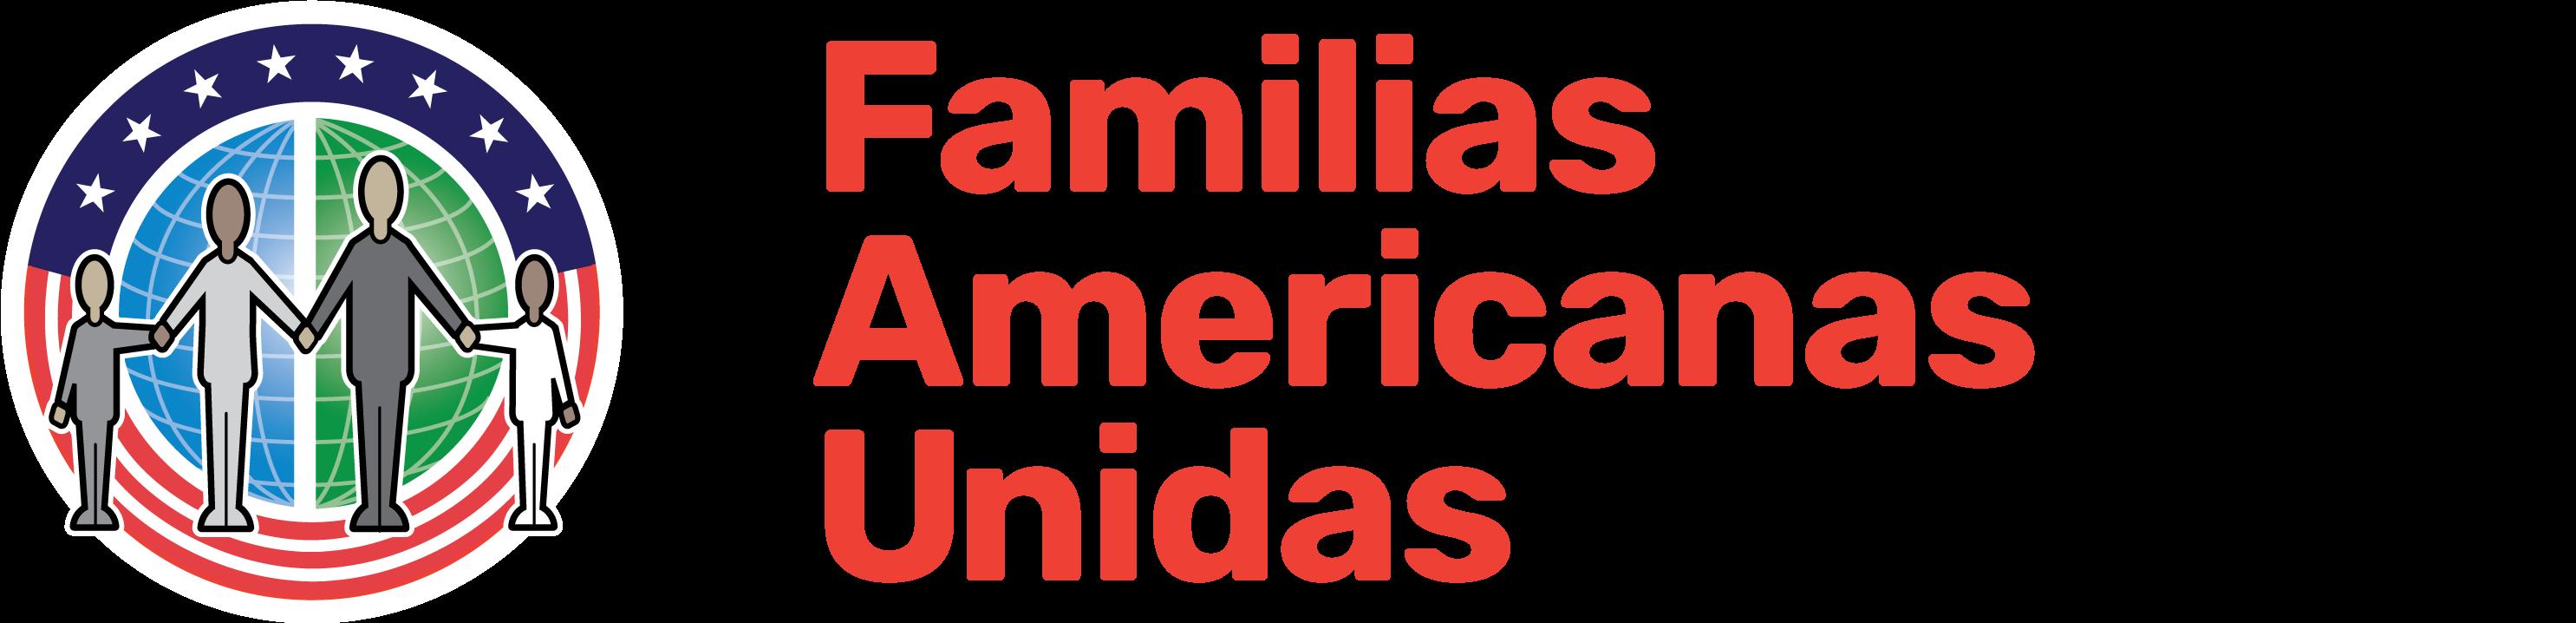 Familias Americanas Unidas